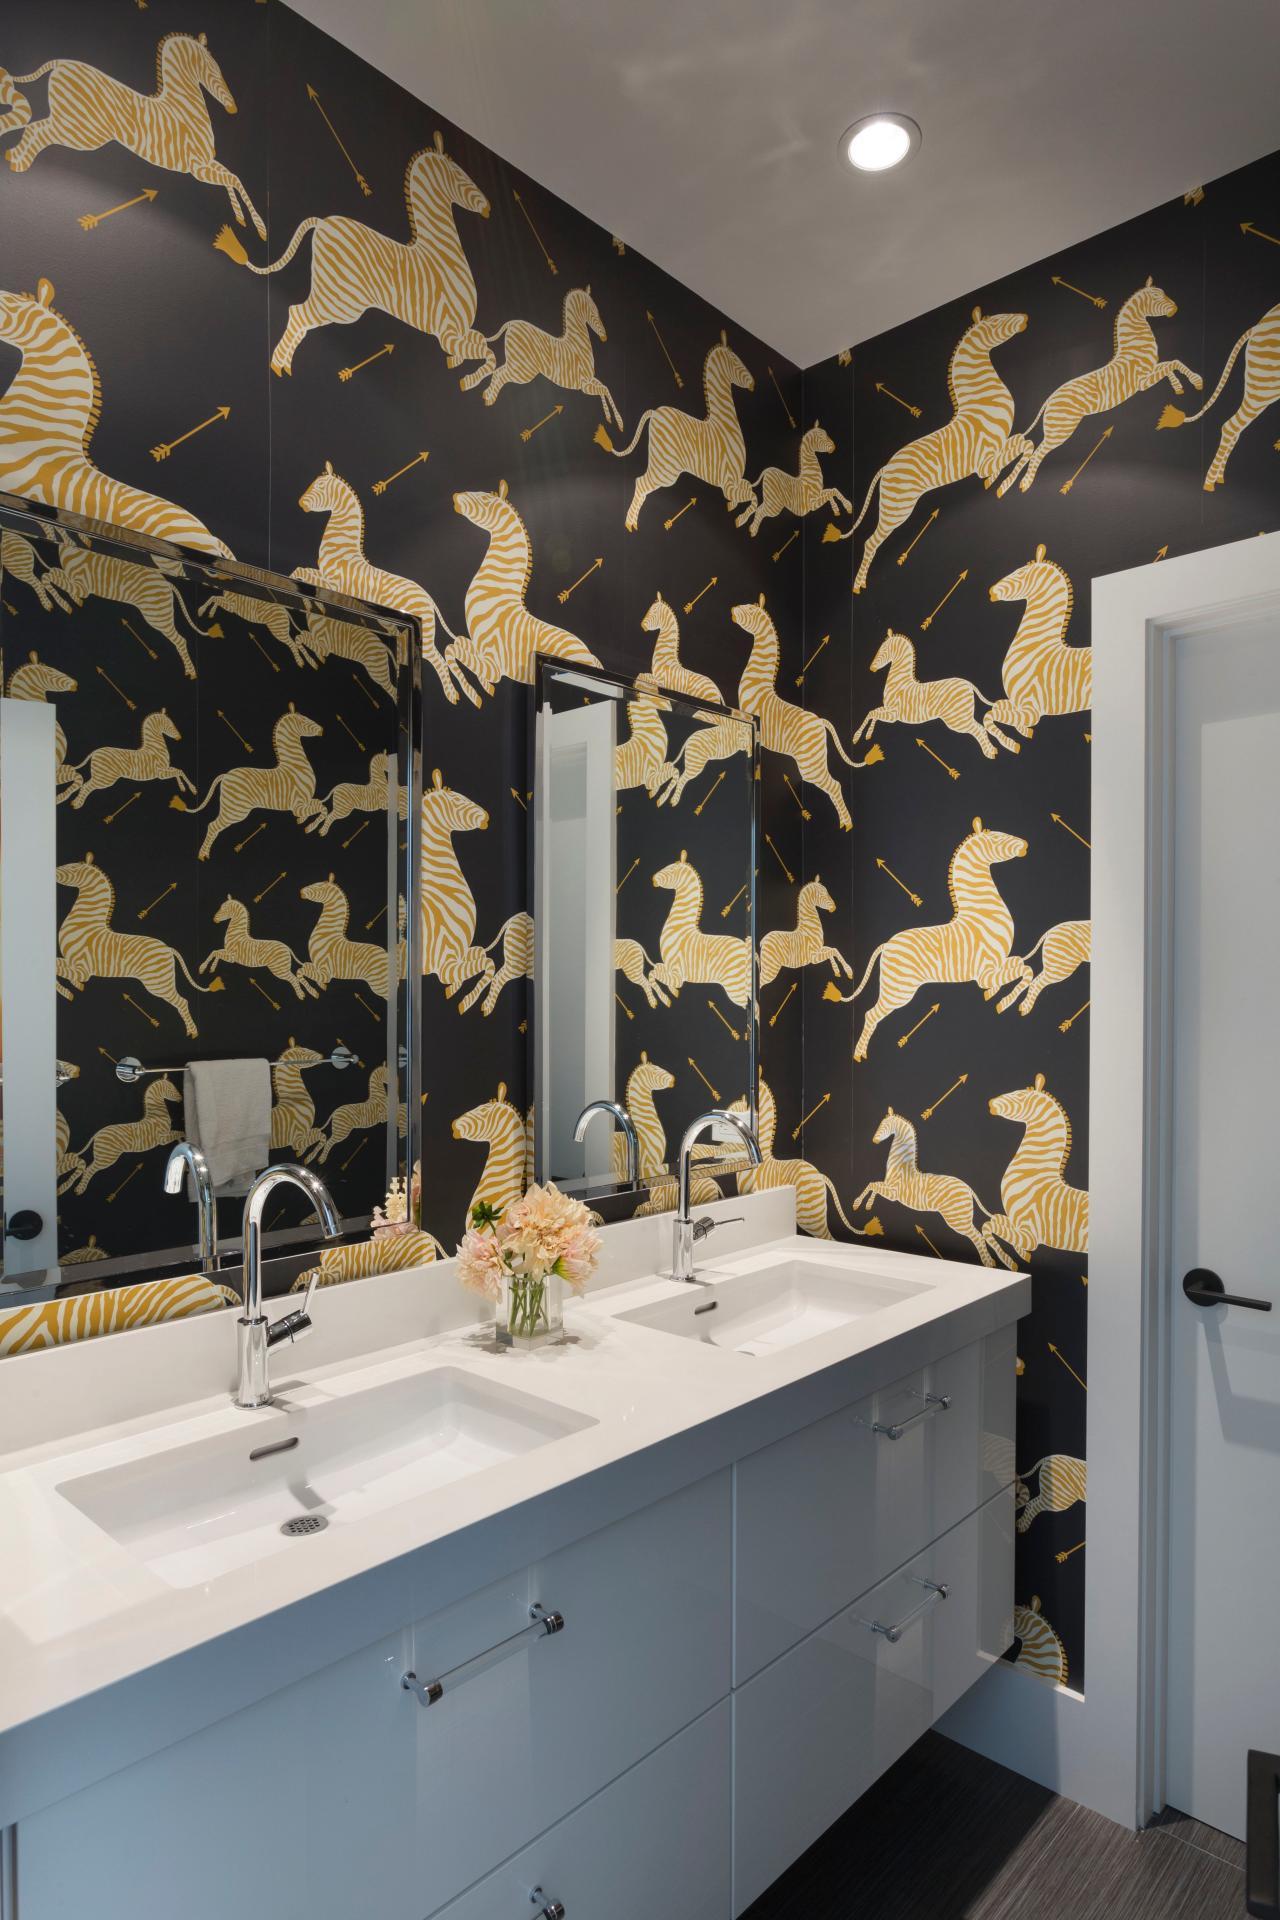 33+] Designer Bathroom Wallpaper on WallpaperSafari on